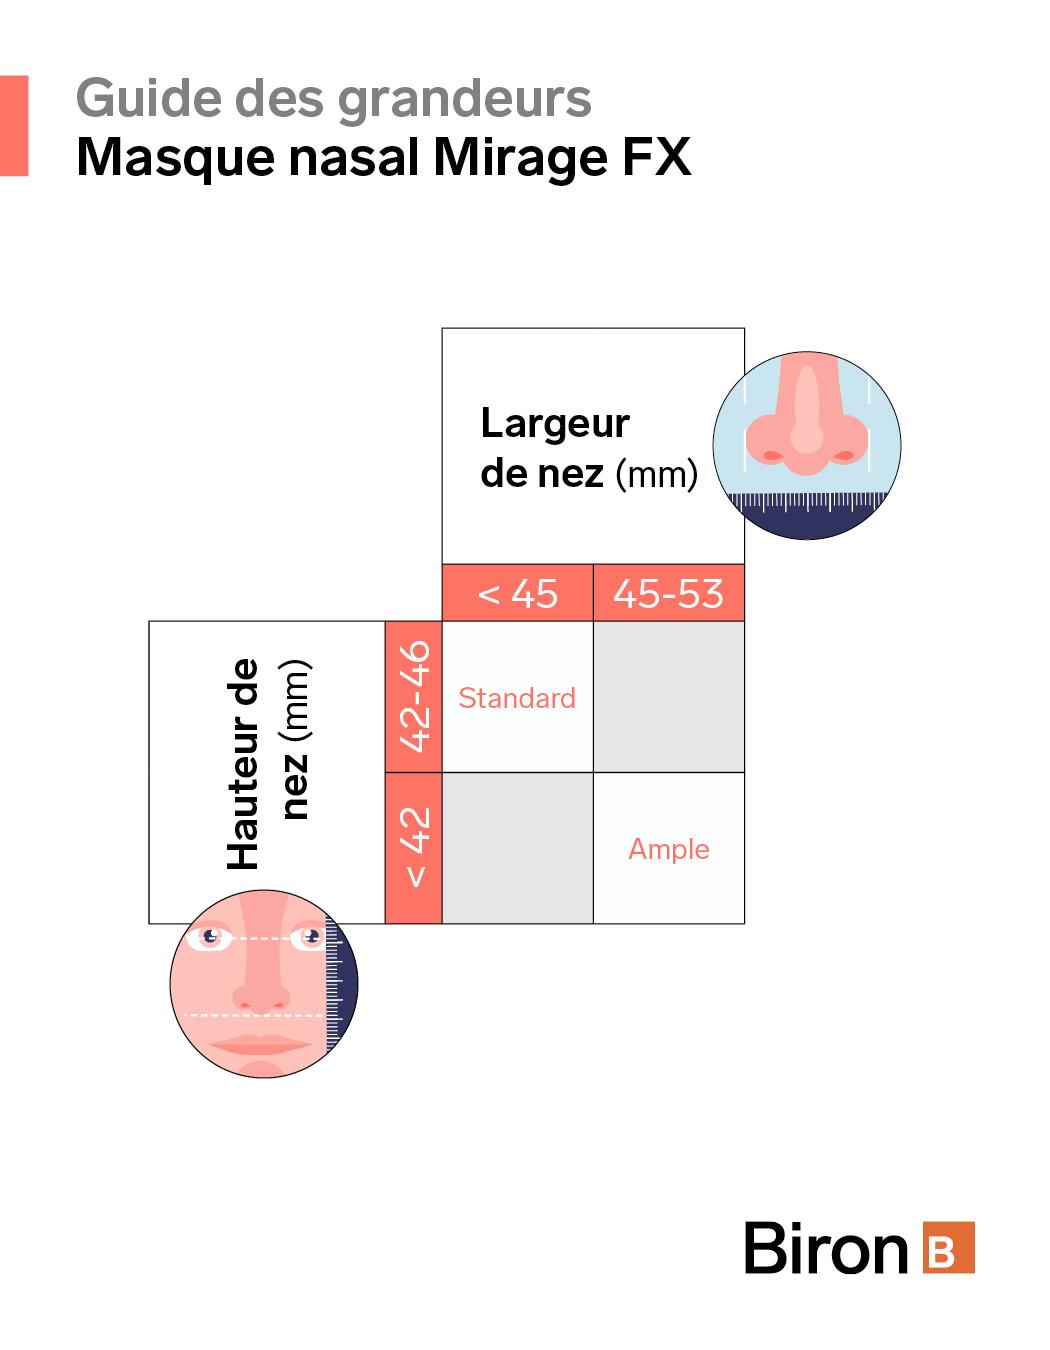 Gabarit grandeur Masque nasal Mirage FX